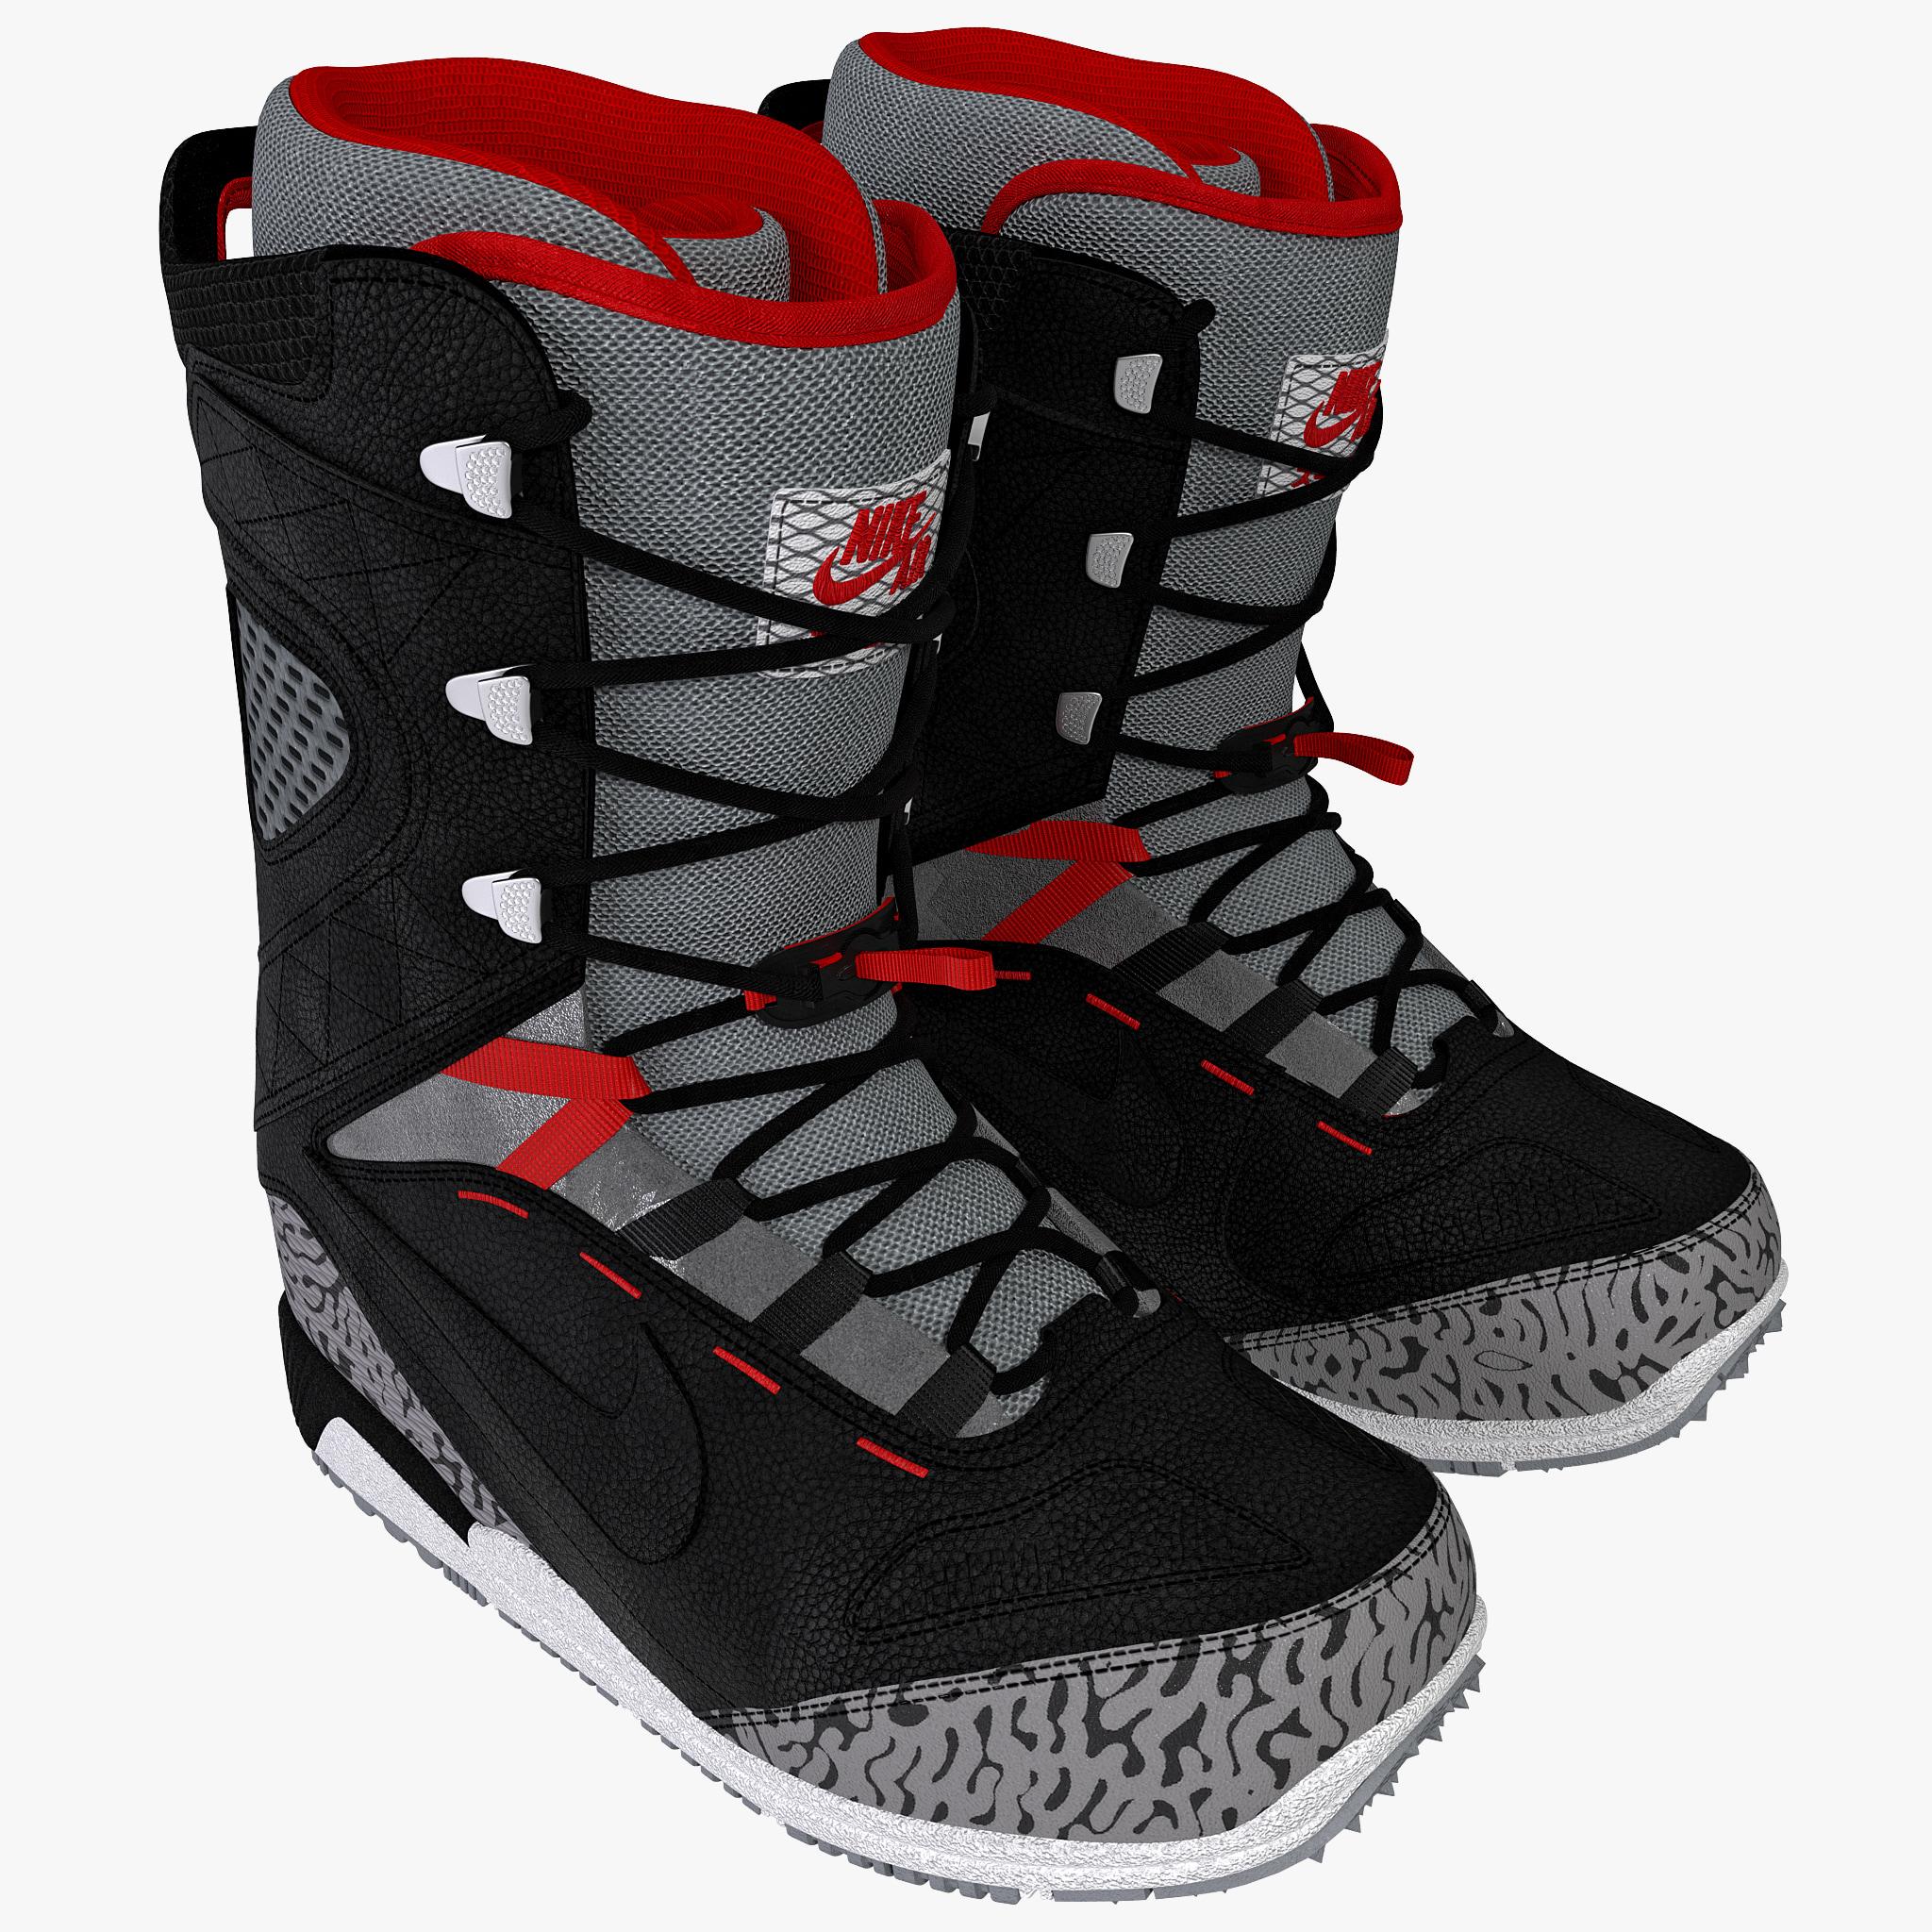 Snowboarding Boots Nike Zoom Kaiju_166.jpg